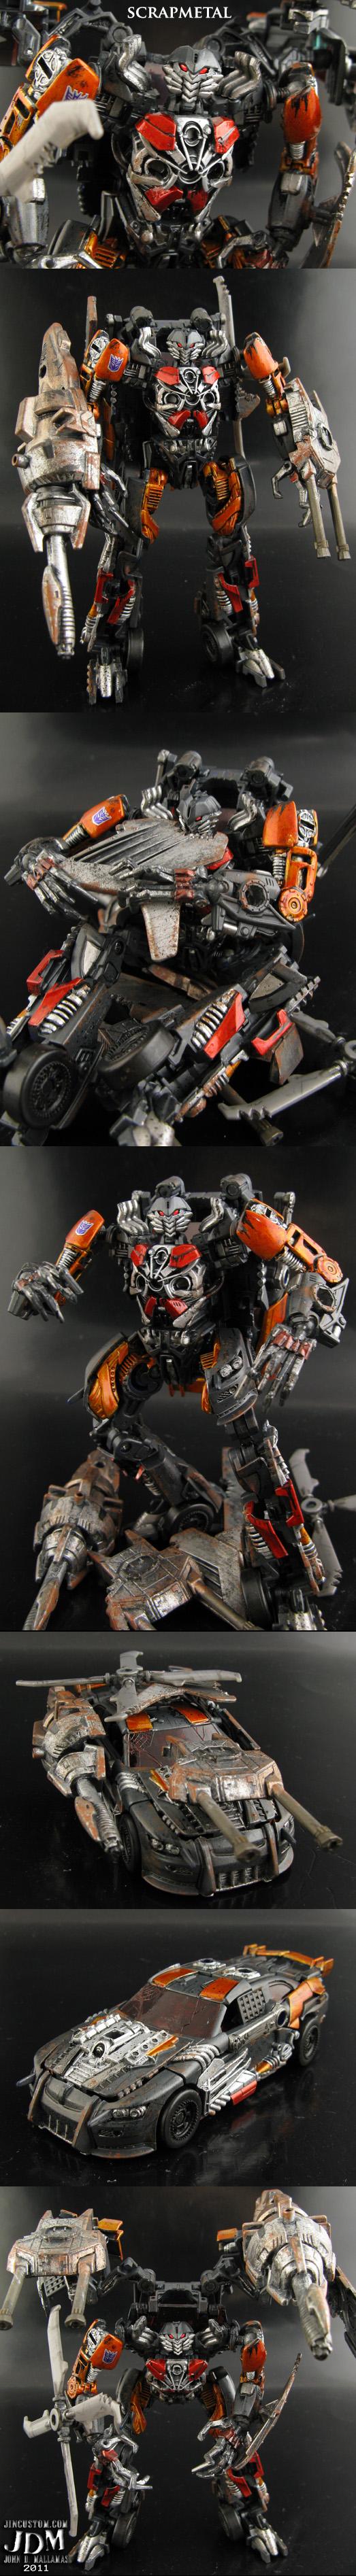 Transformers Scrapmetal